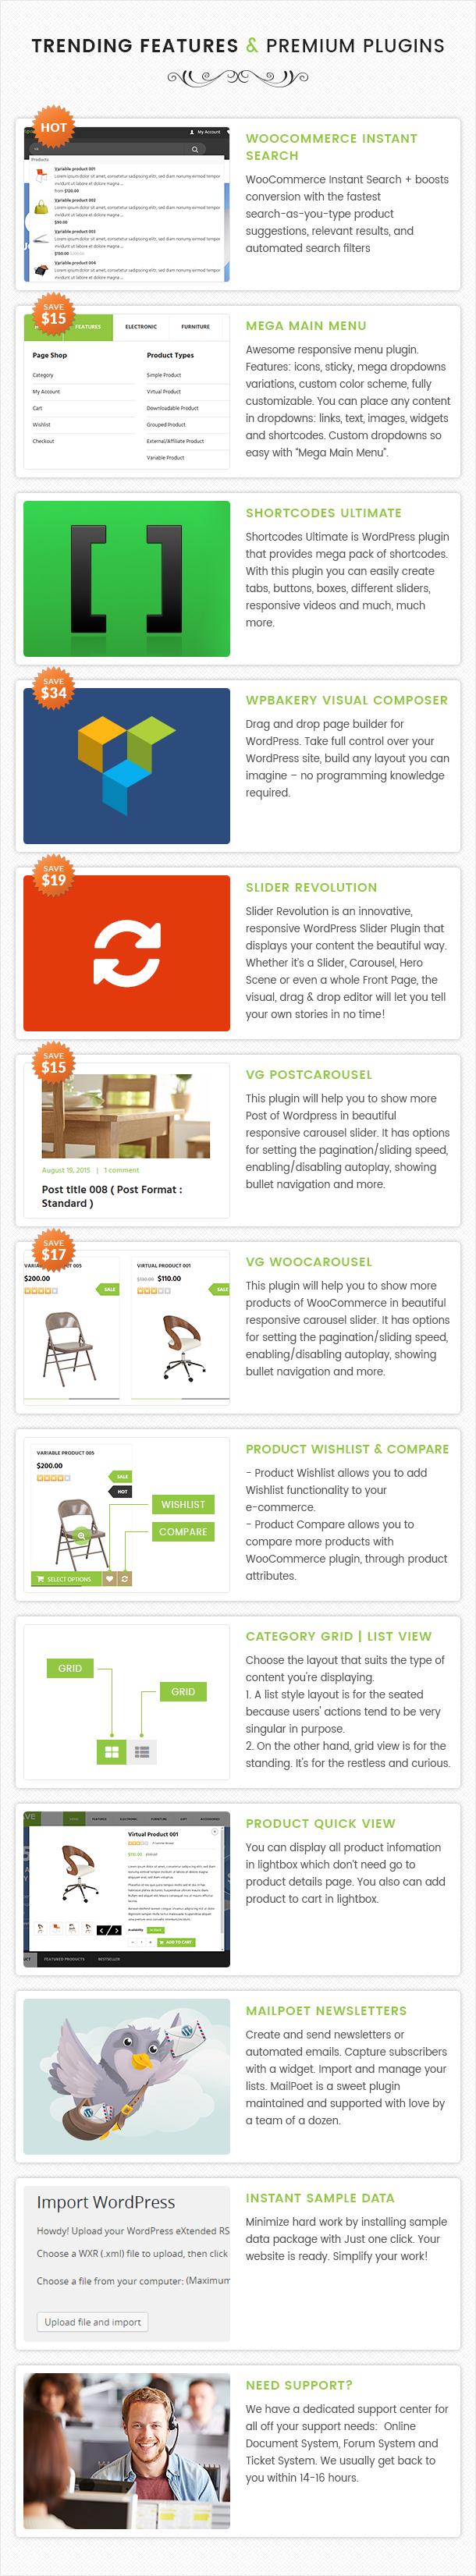 VG Primave - Multipurpose WooCommerce WordPress Theme - 35